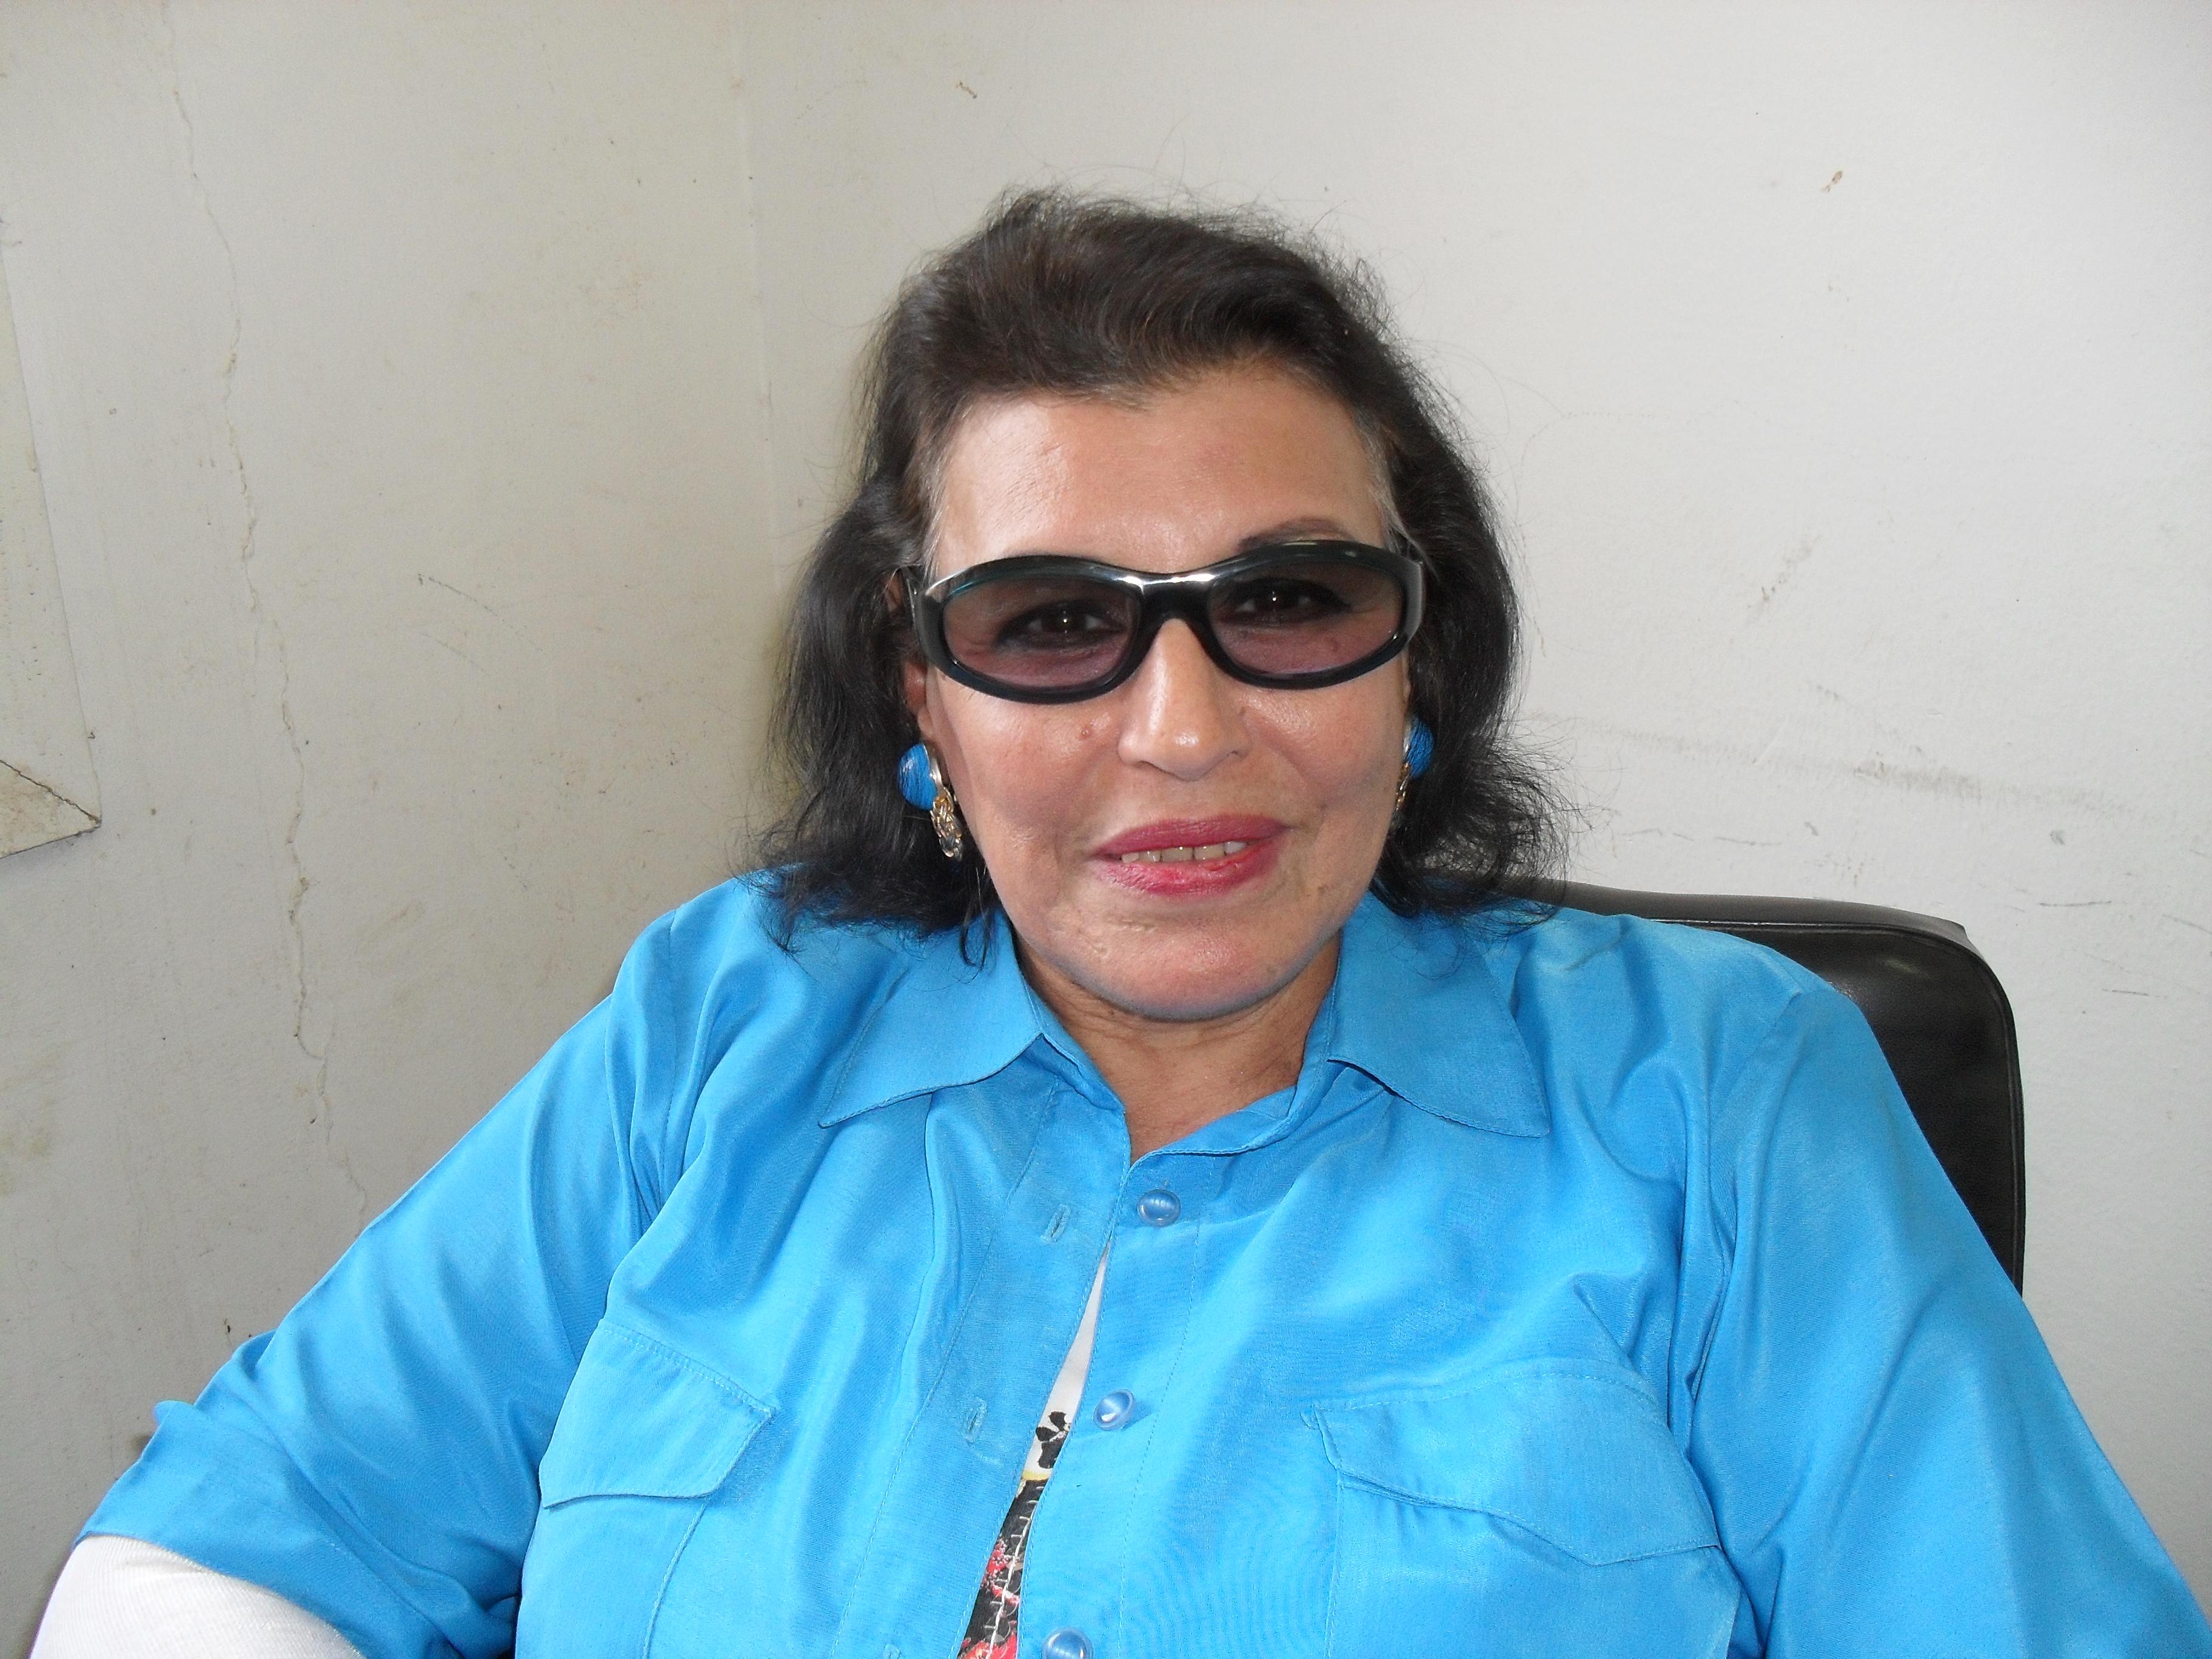 Amal Mohammed Kamel Bayoumi El-Sopky